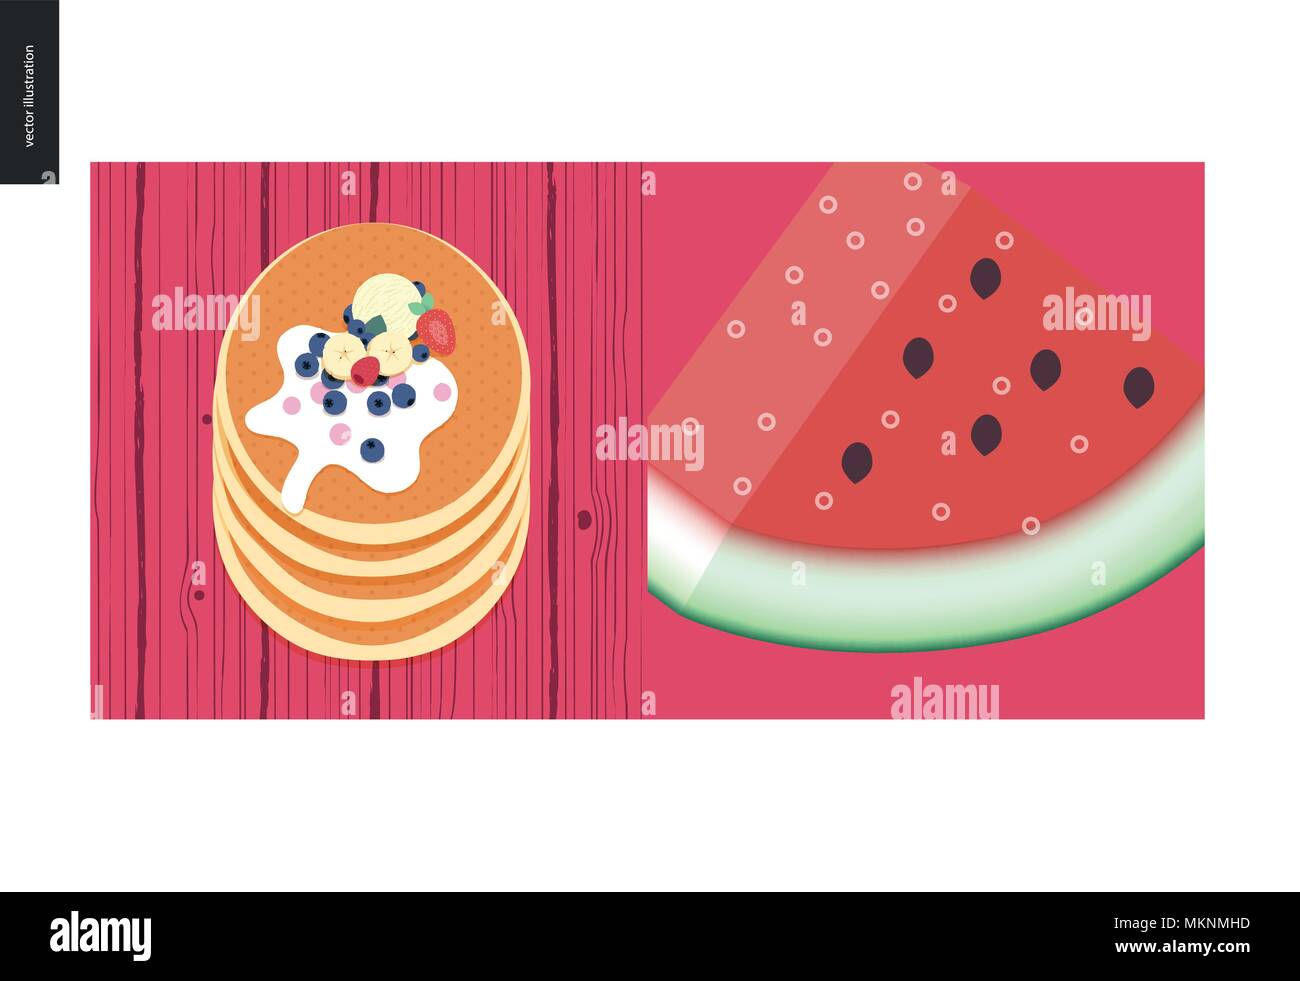 Simple things - color - flat cartoon vector illustration of stack of pancakes, vanilla ice cream scoop, bananas, huckleberries, strawberries, raspberr - Stock Vector